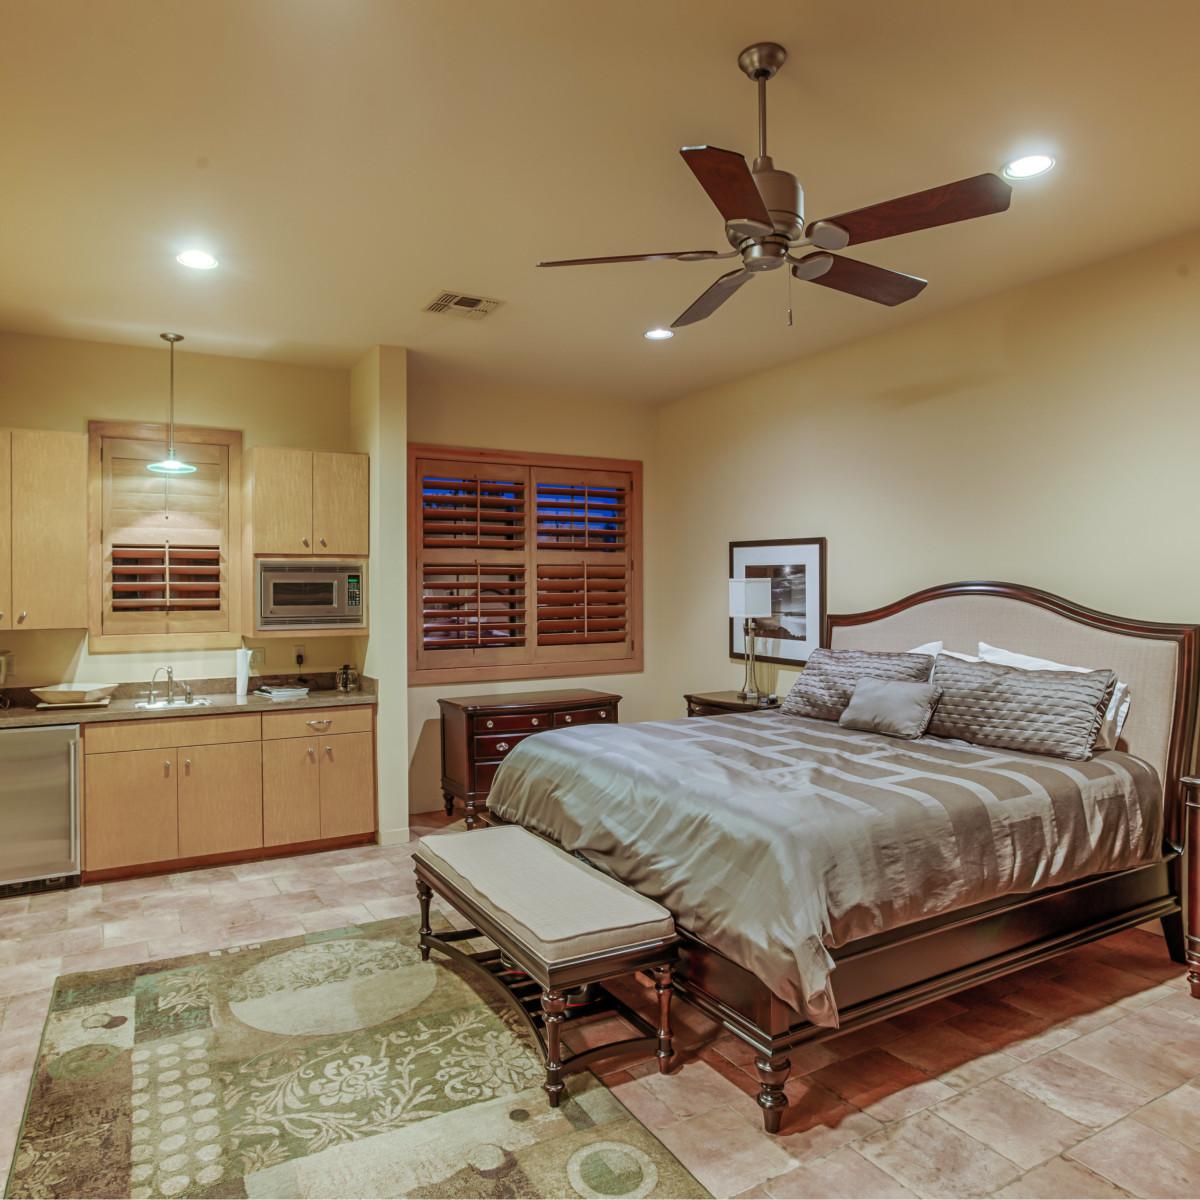 22334 Angostura San Antonio house for sale guest house